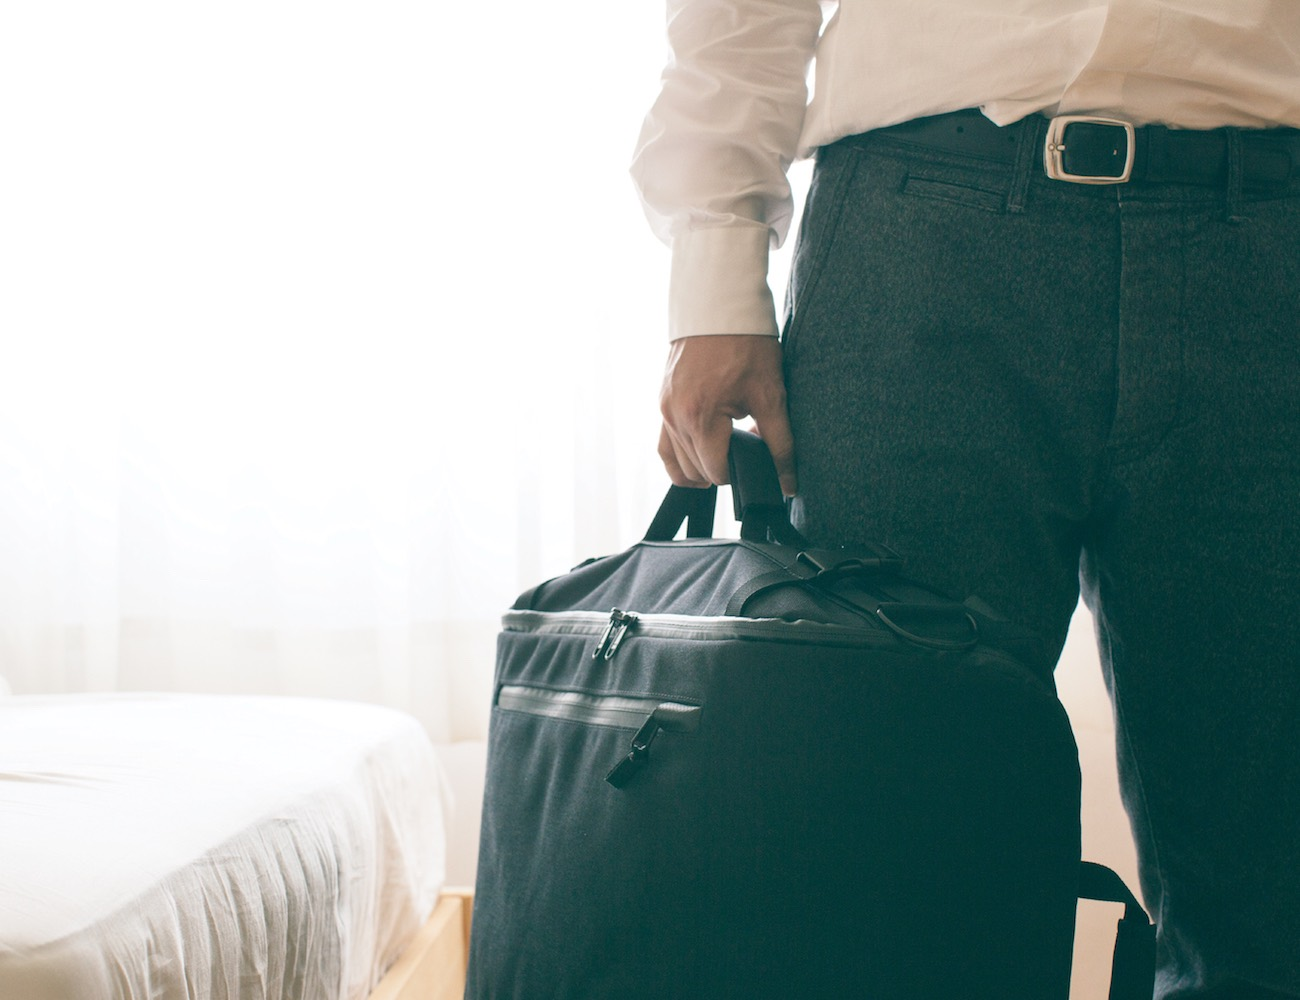 The Nómada – World's First 100% Free Modularized Bag